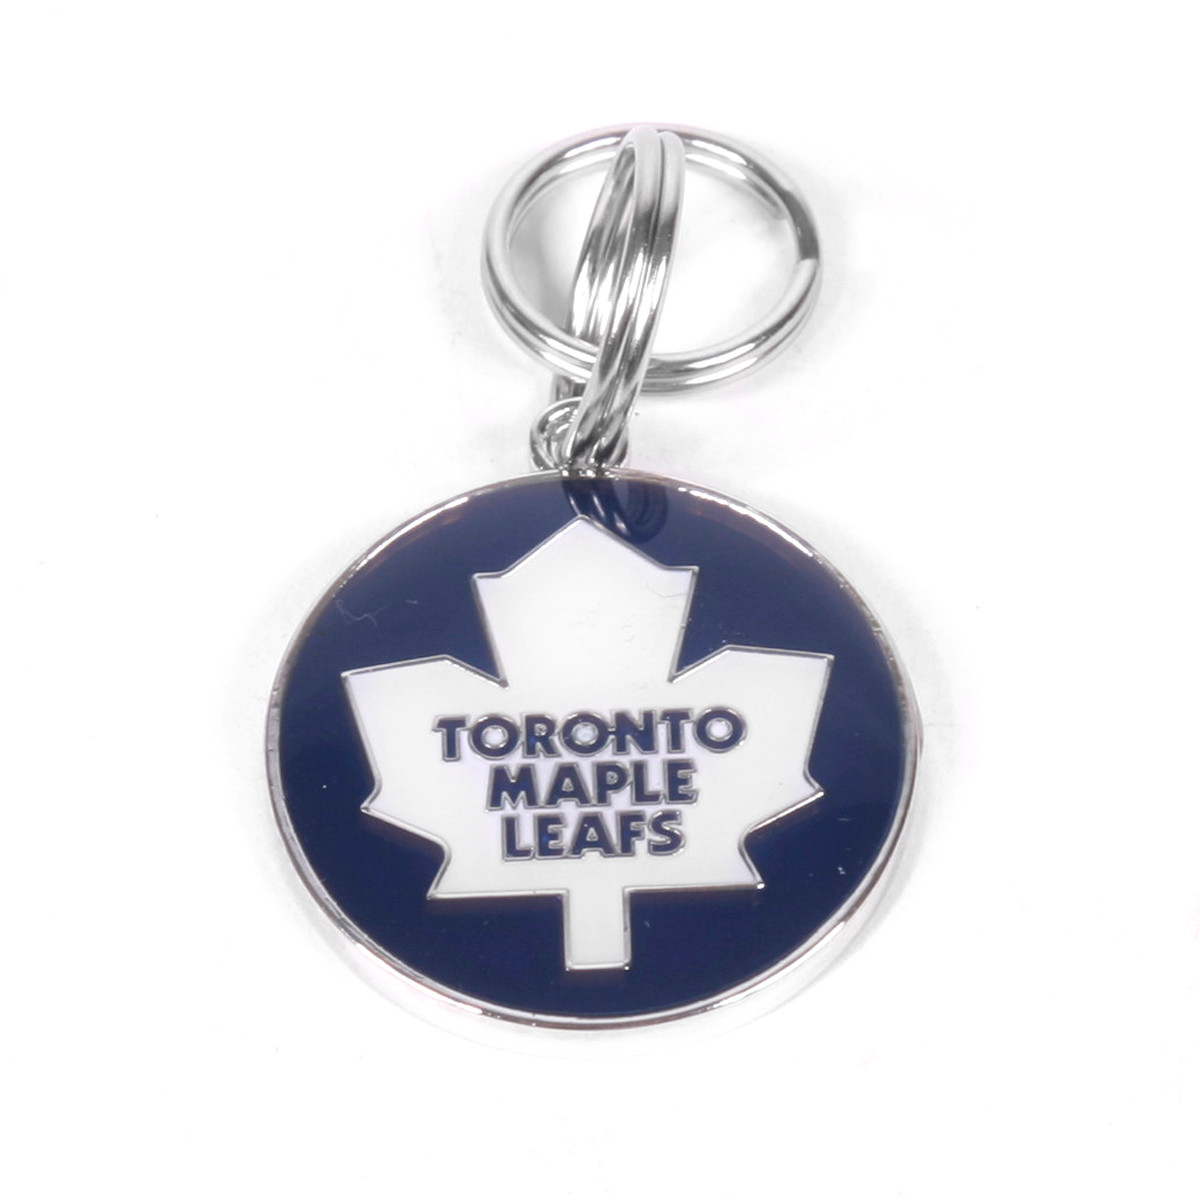 Toronto Maple Leafs Dog Collar